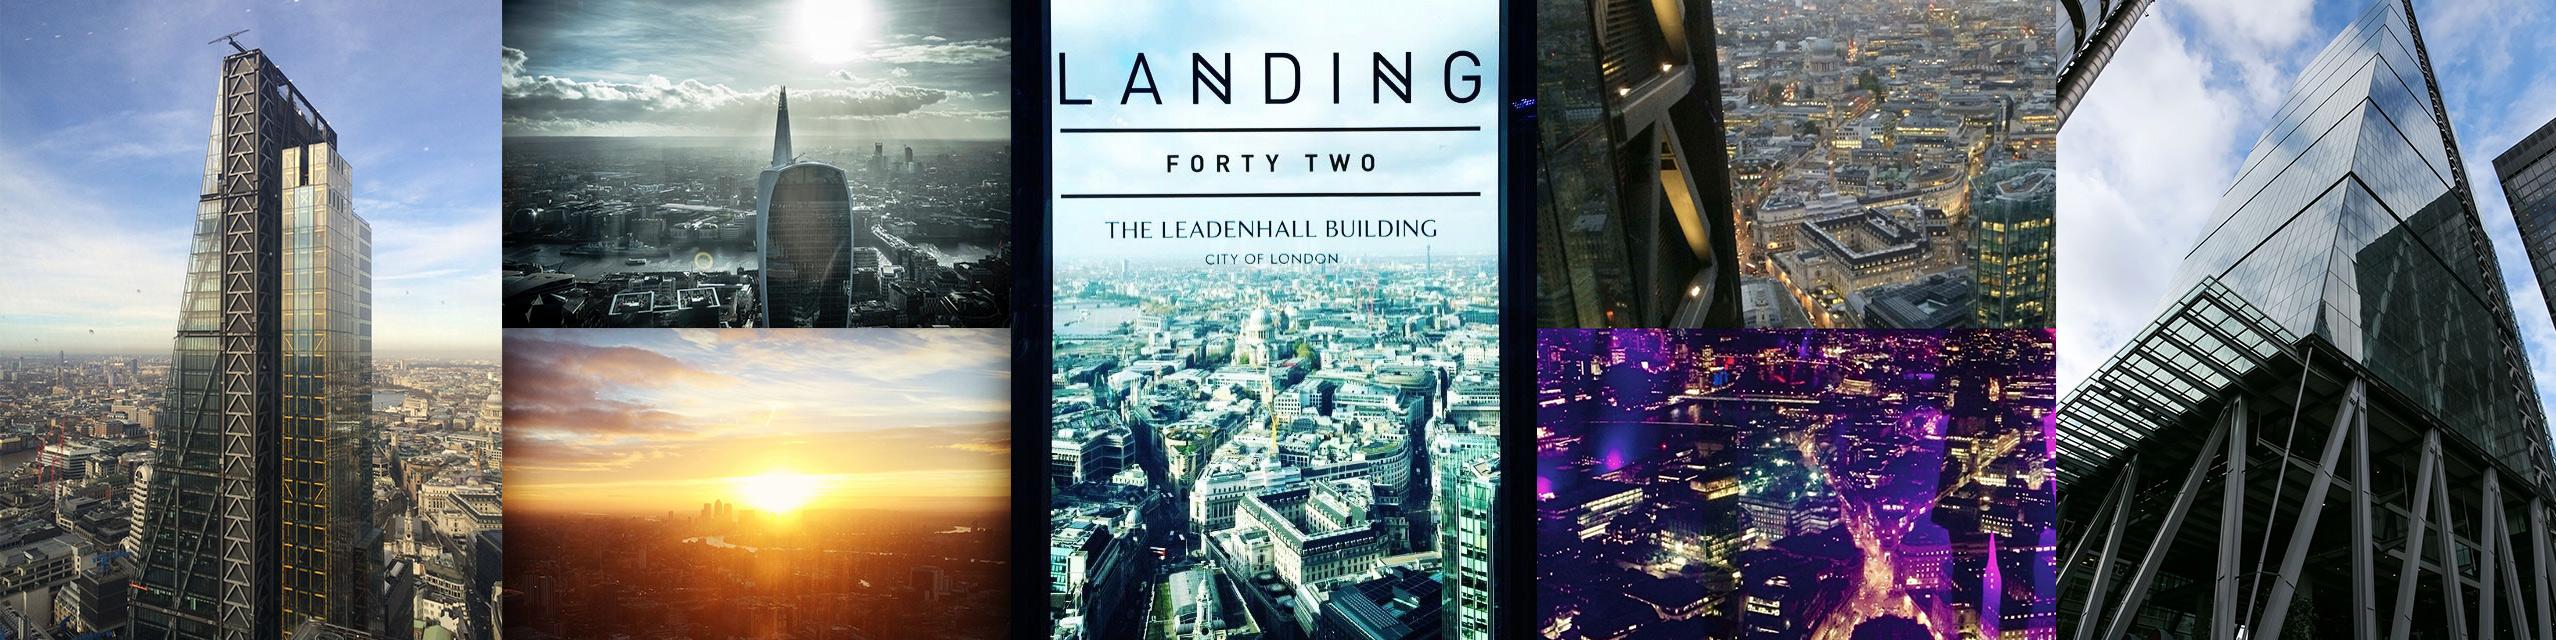 landing 42 photos